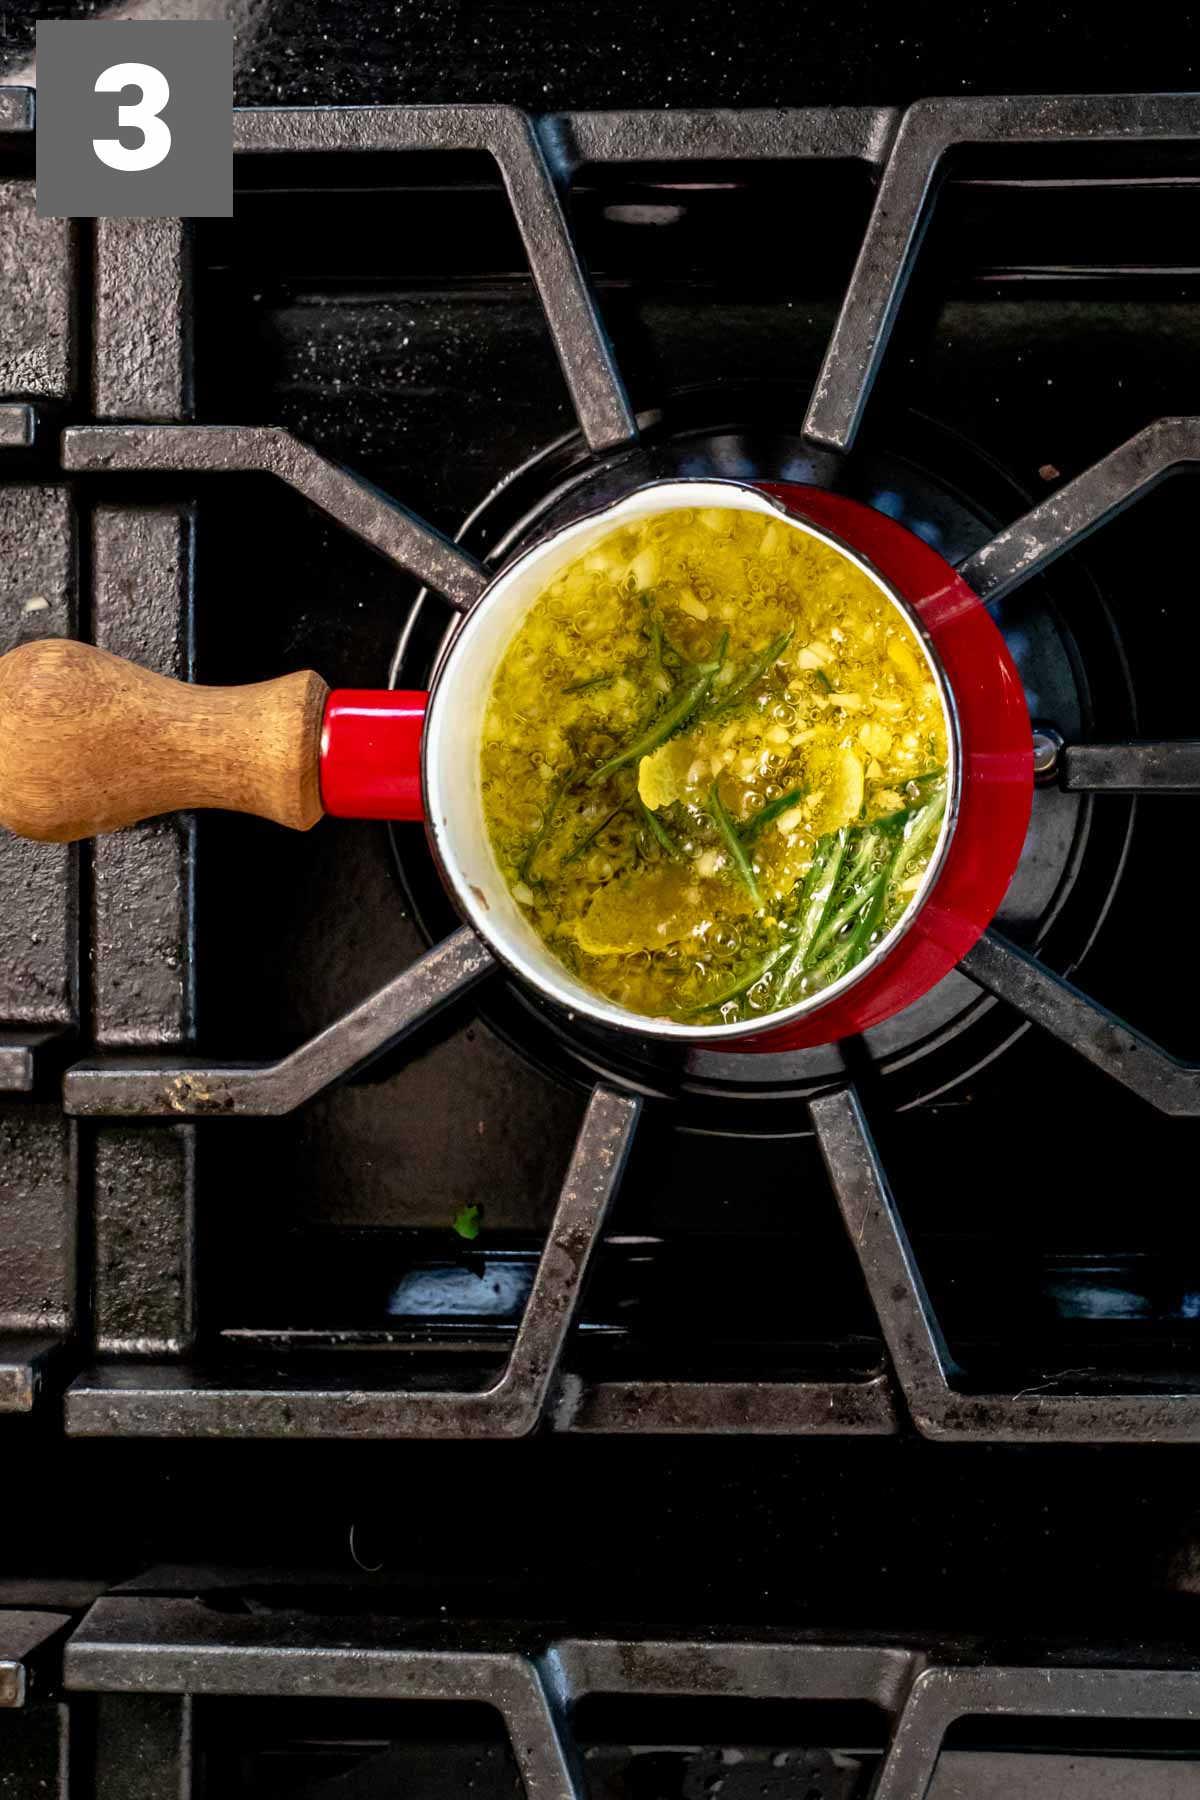 simmer the rosemary and lemon peel in the bagna cauda